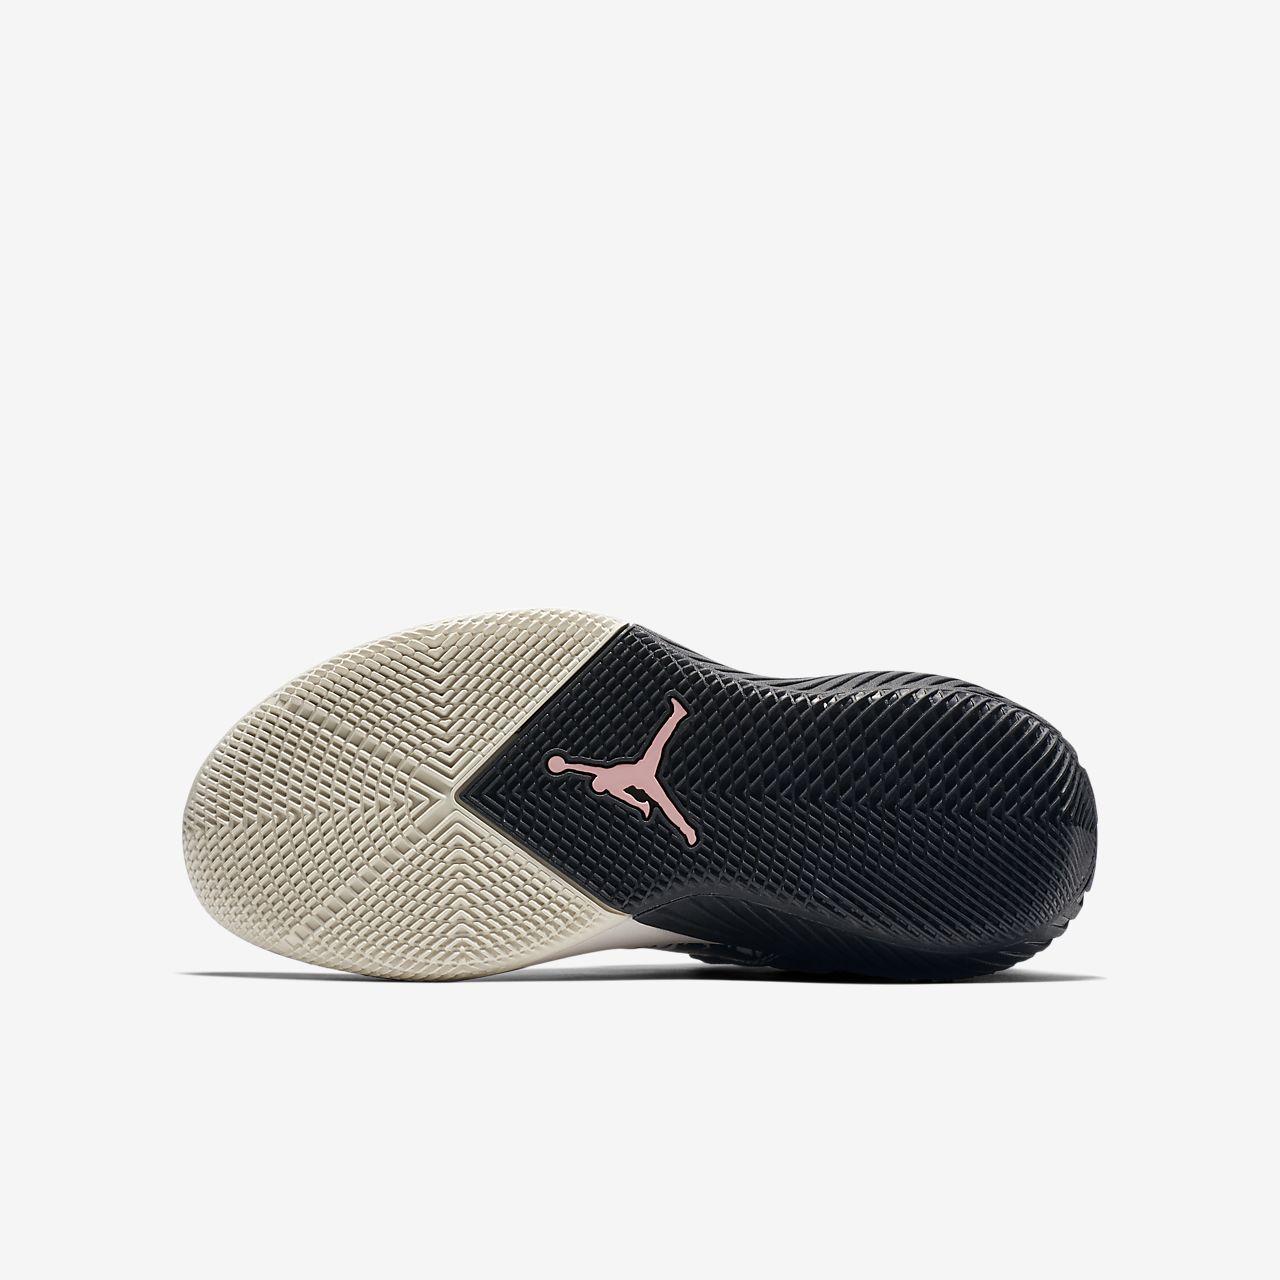 698d5da60079 Jordan  Why Not   Zer0.1 Low Boys  Basketball Shoe. Nike.com ID